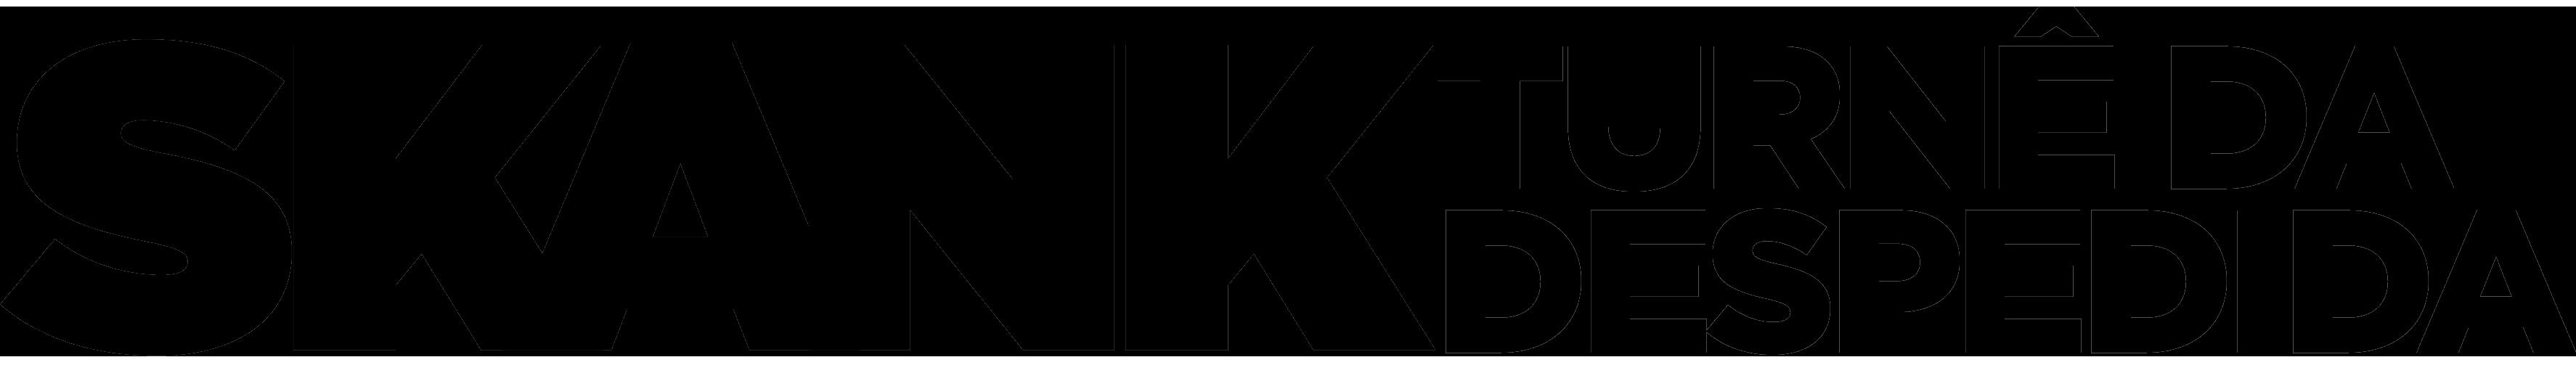 Logo_Skank+Turne_Preta